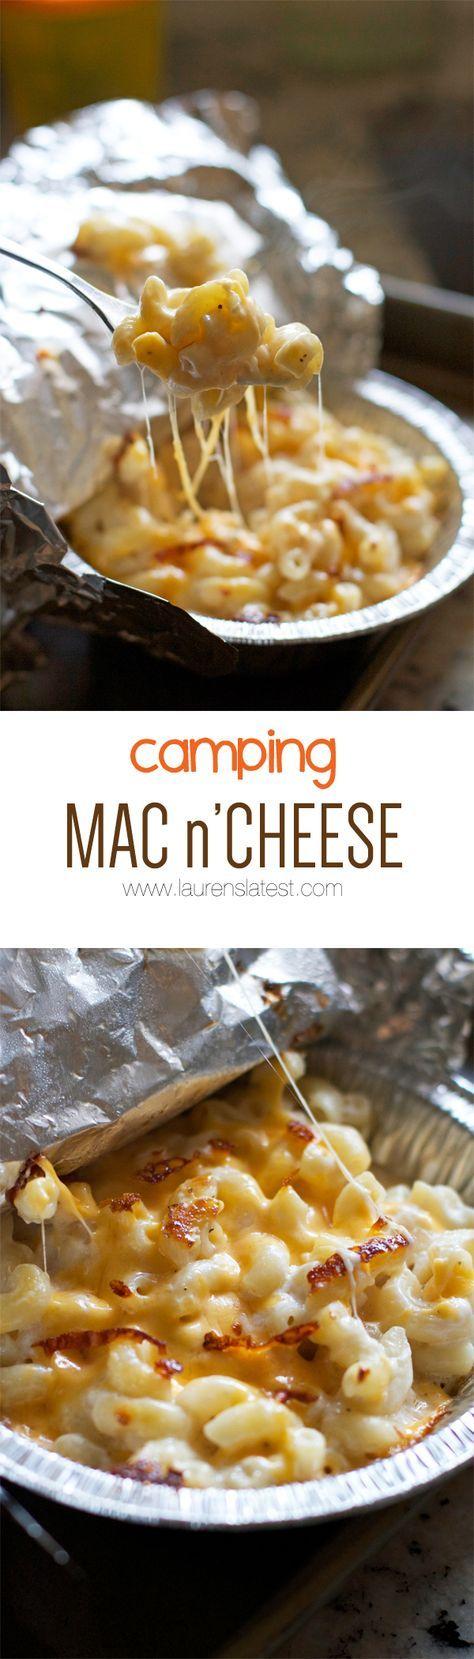 Camping Mac n'Cheese